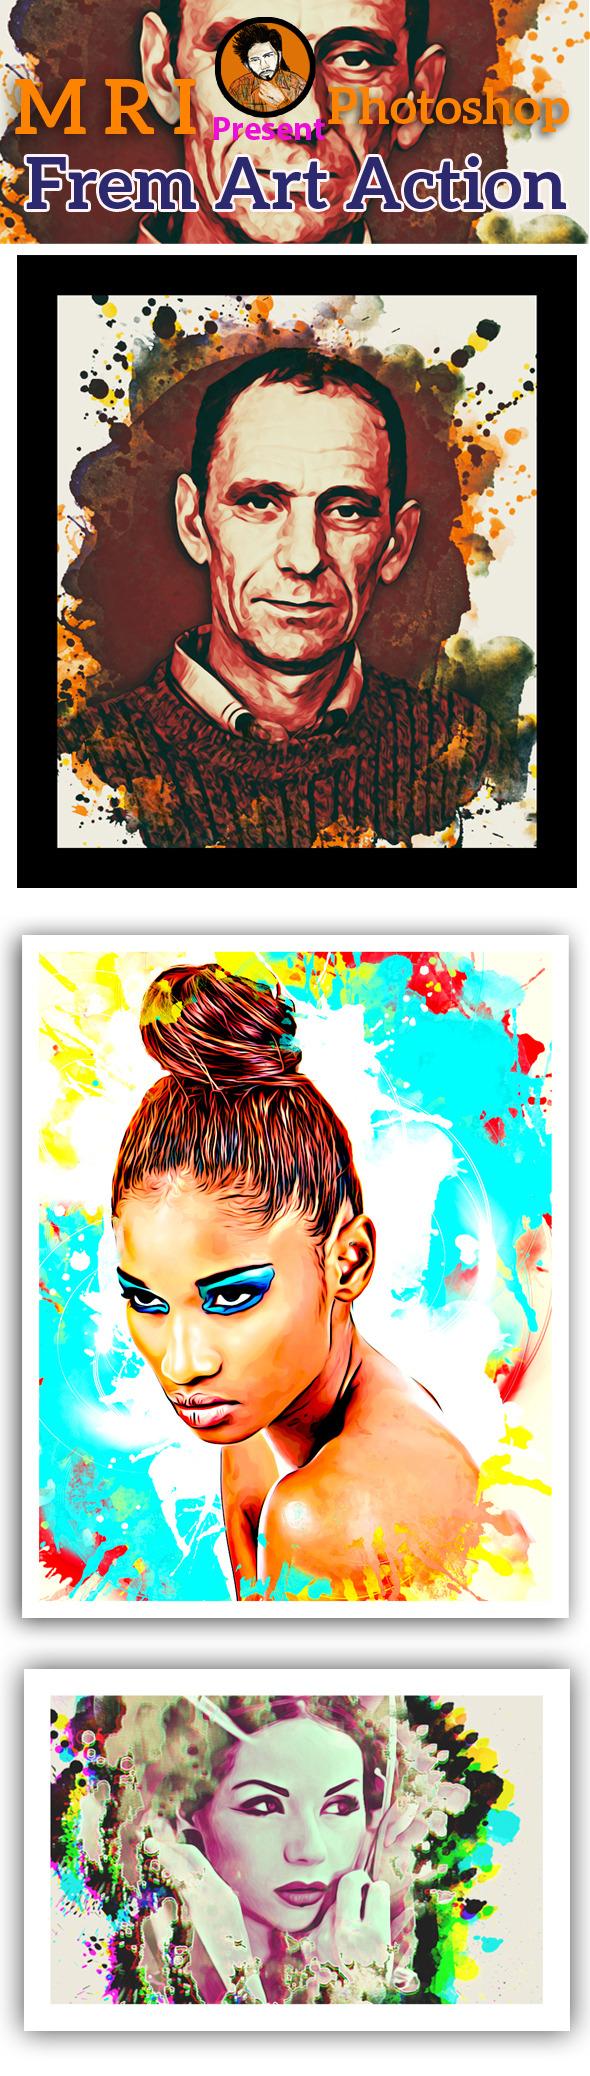 GraphicRiver Frem Art Action 9197222